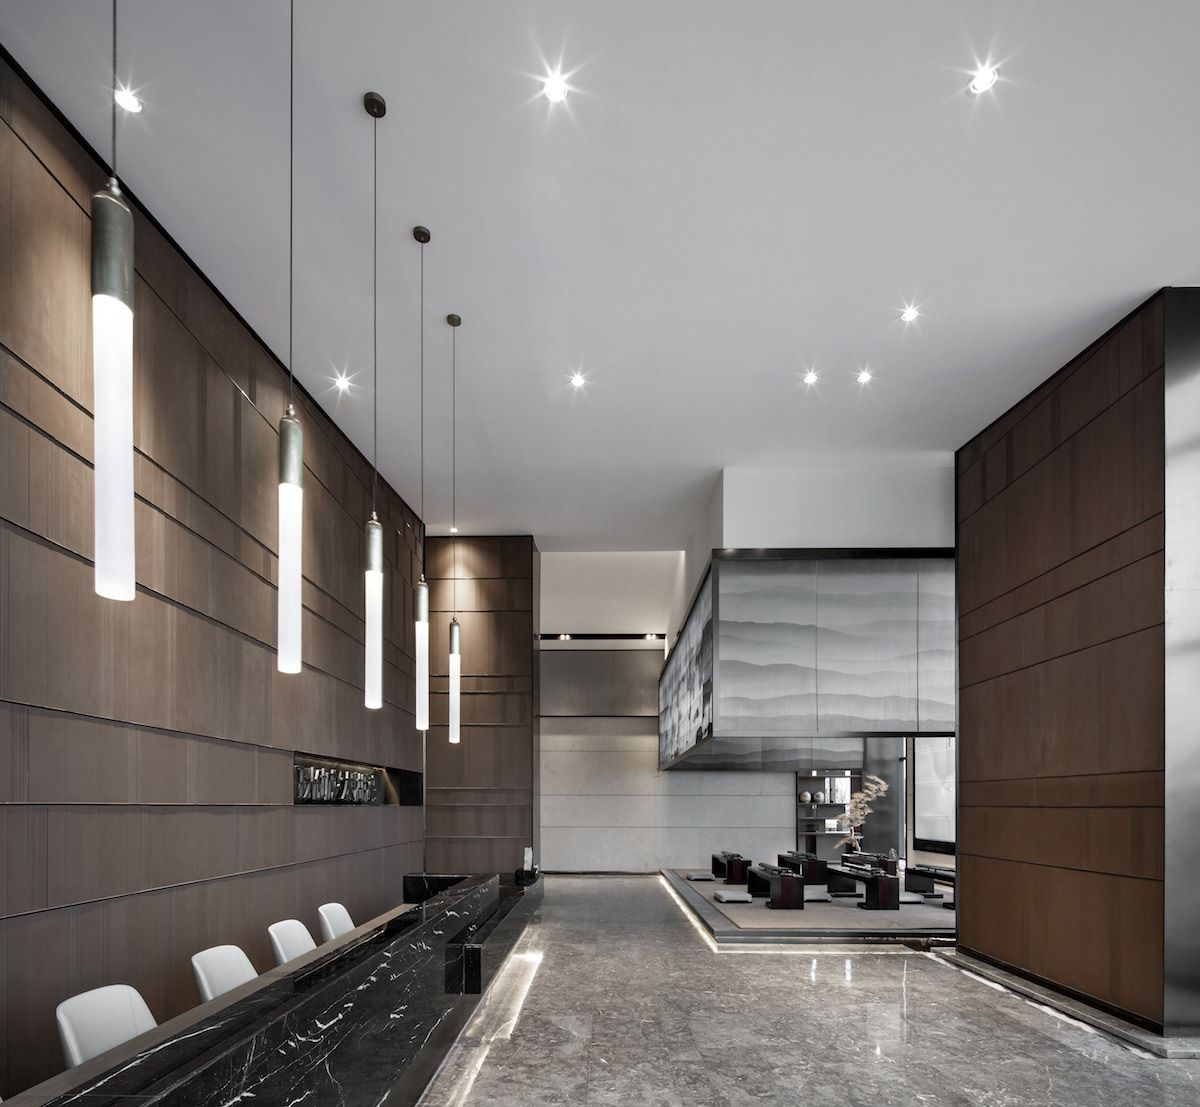 Semicircular Ktv Room Interior Design: Pin On 售楼部高档吊灯&台灯&壁灯&落地灯&装饰灯